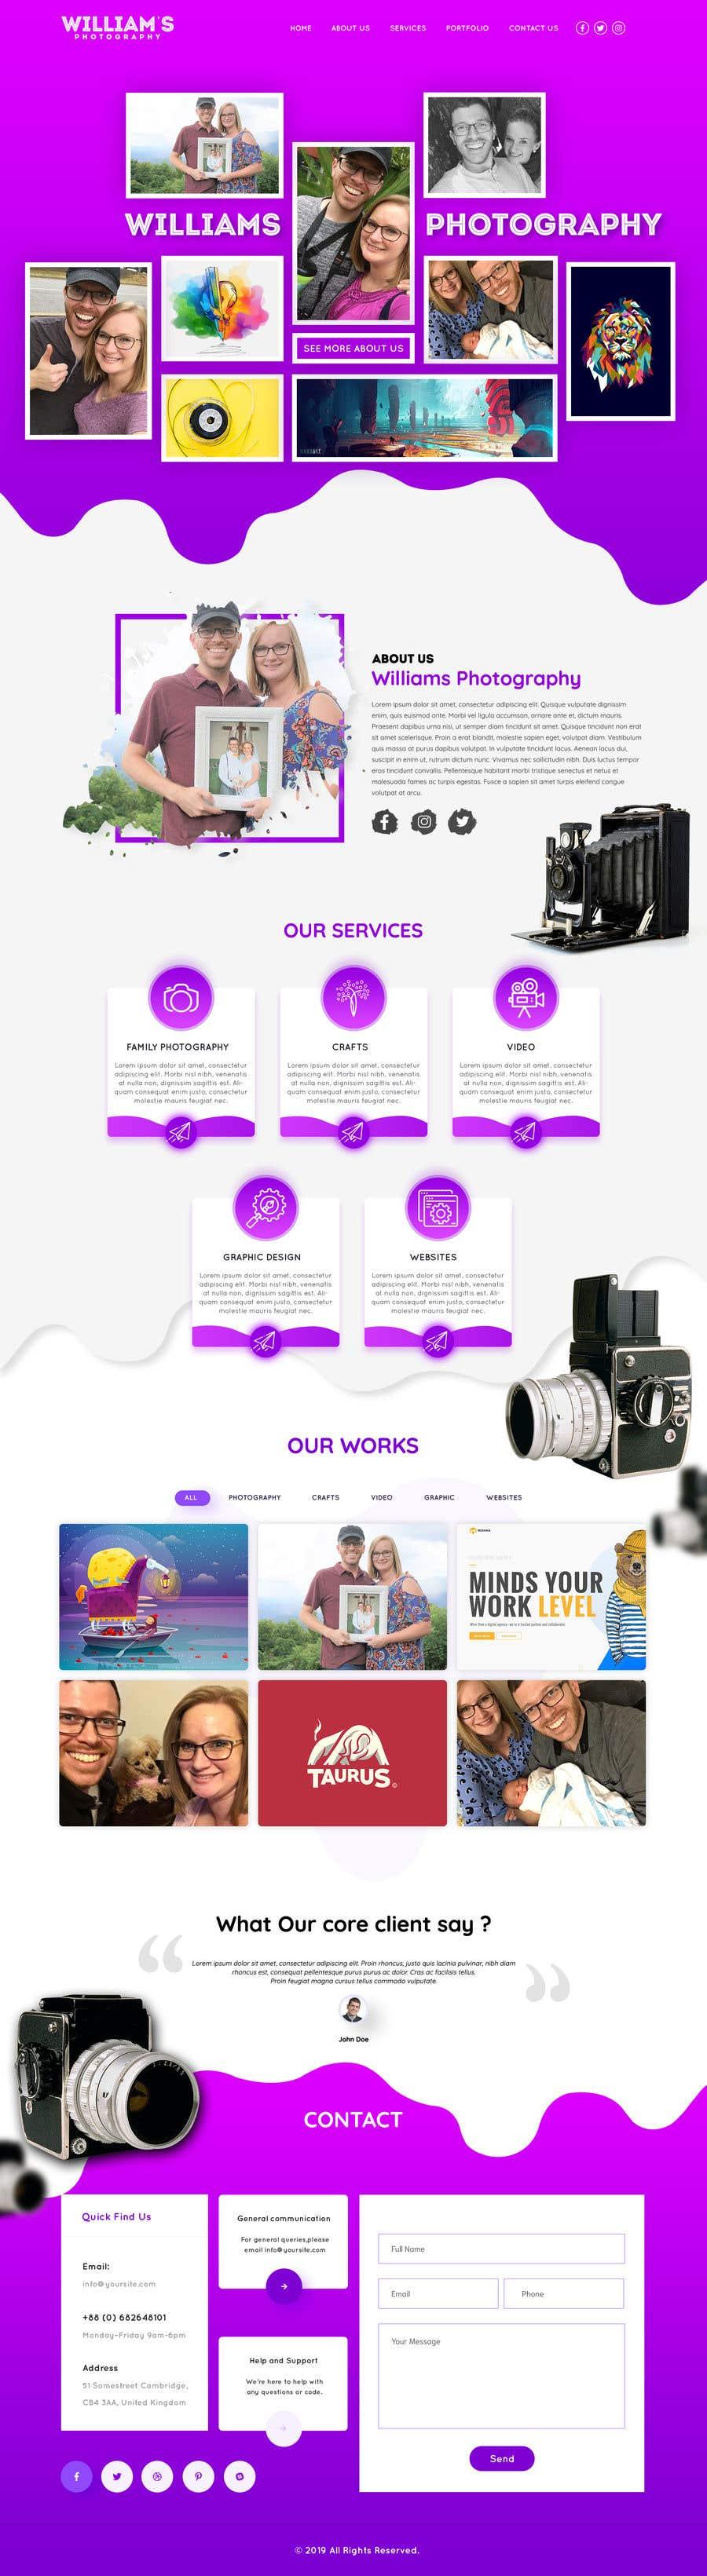 Kilpailutyö #27 kilpailussa Design Clean, Minimalist, Professional Website Layout and Logo